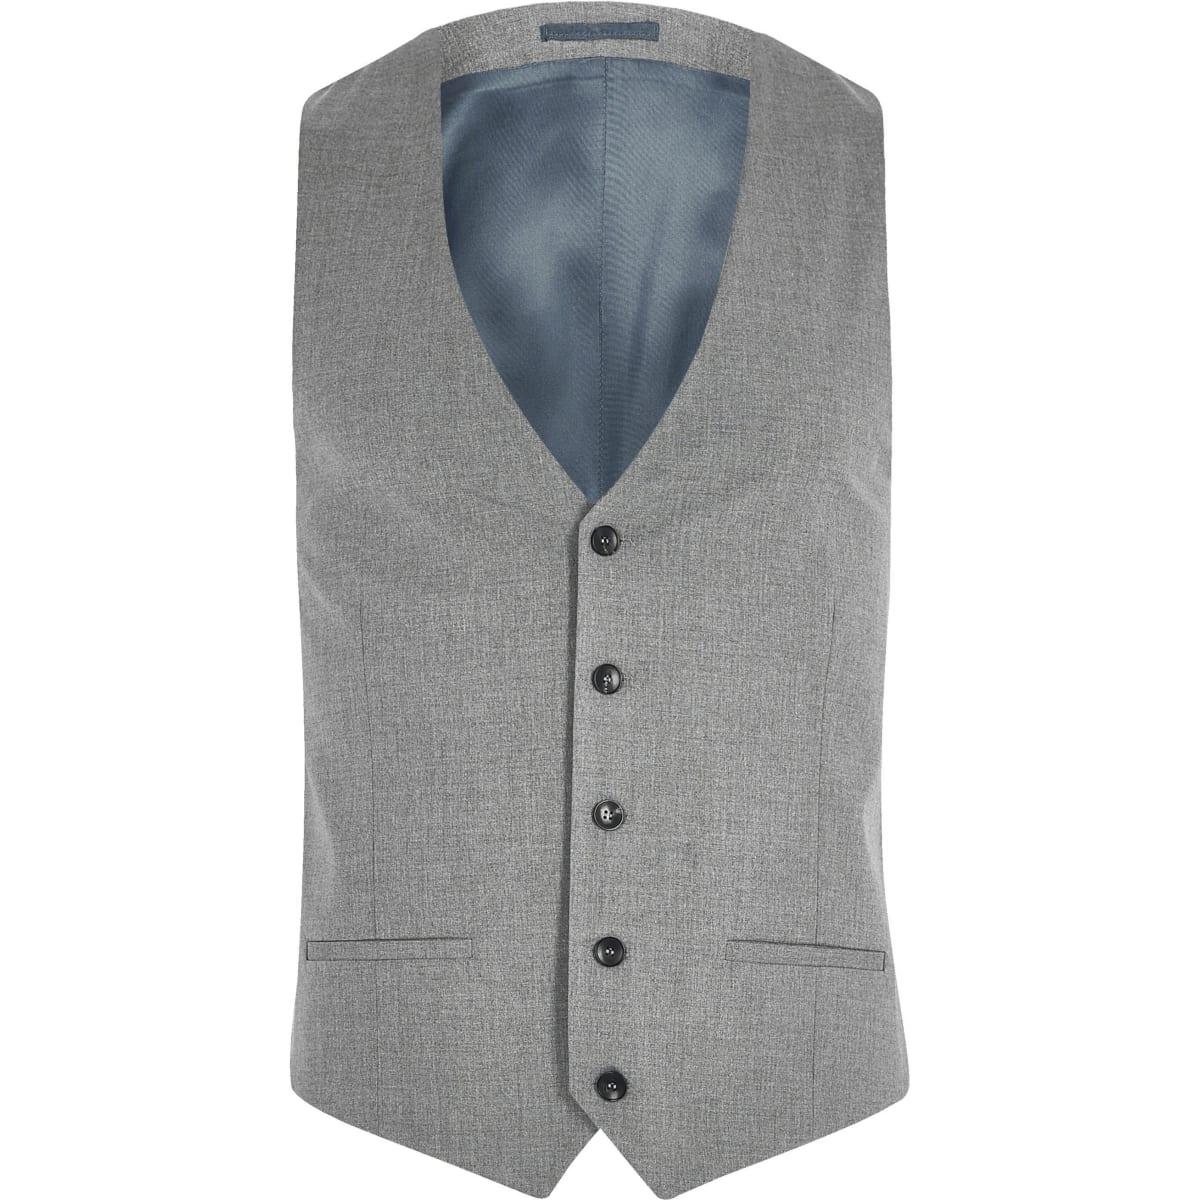 Grey slim fit suit waistcoat